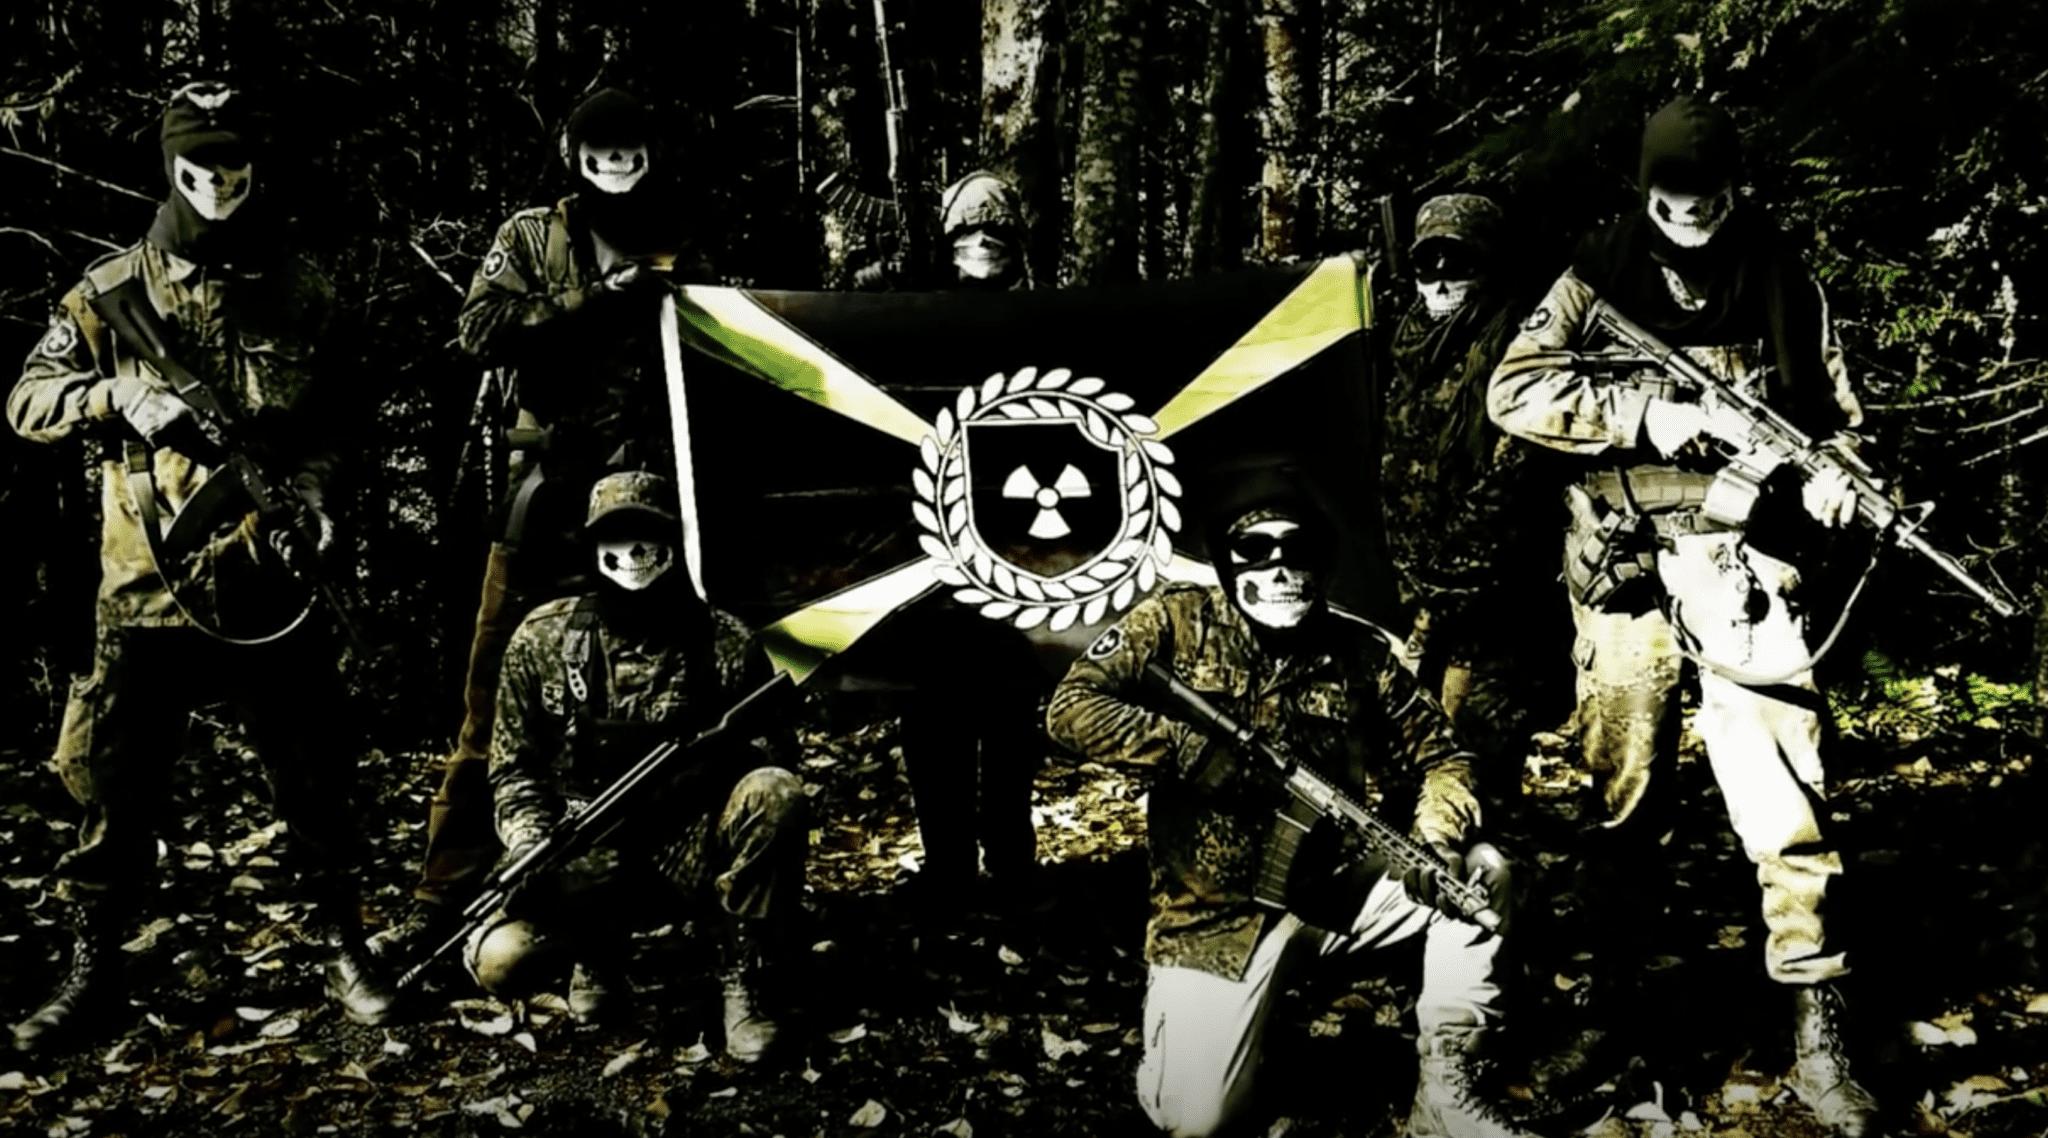 Atomwaffen Division neo nazi